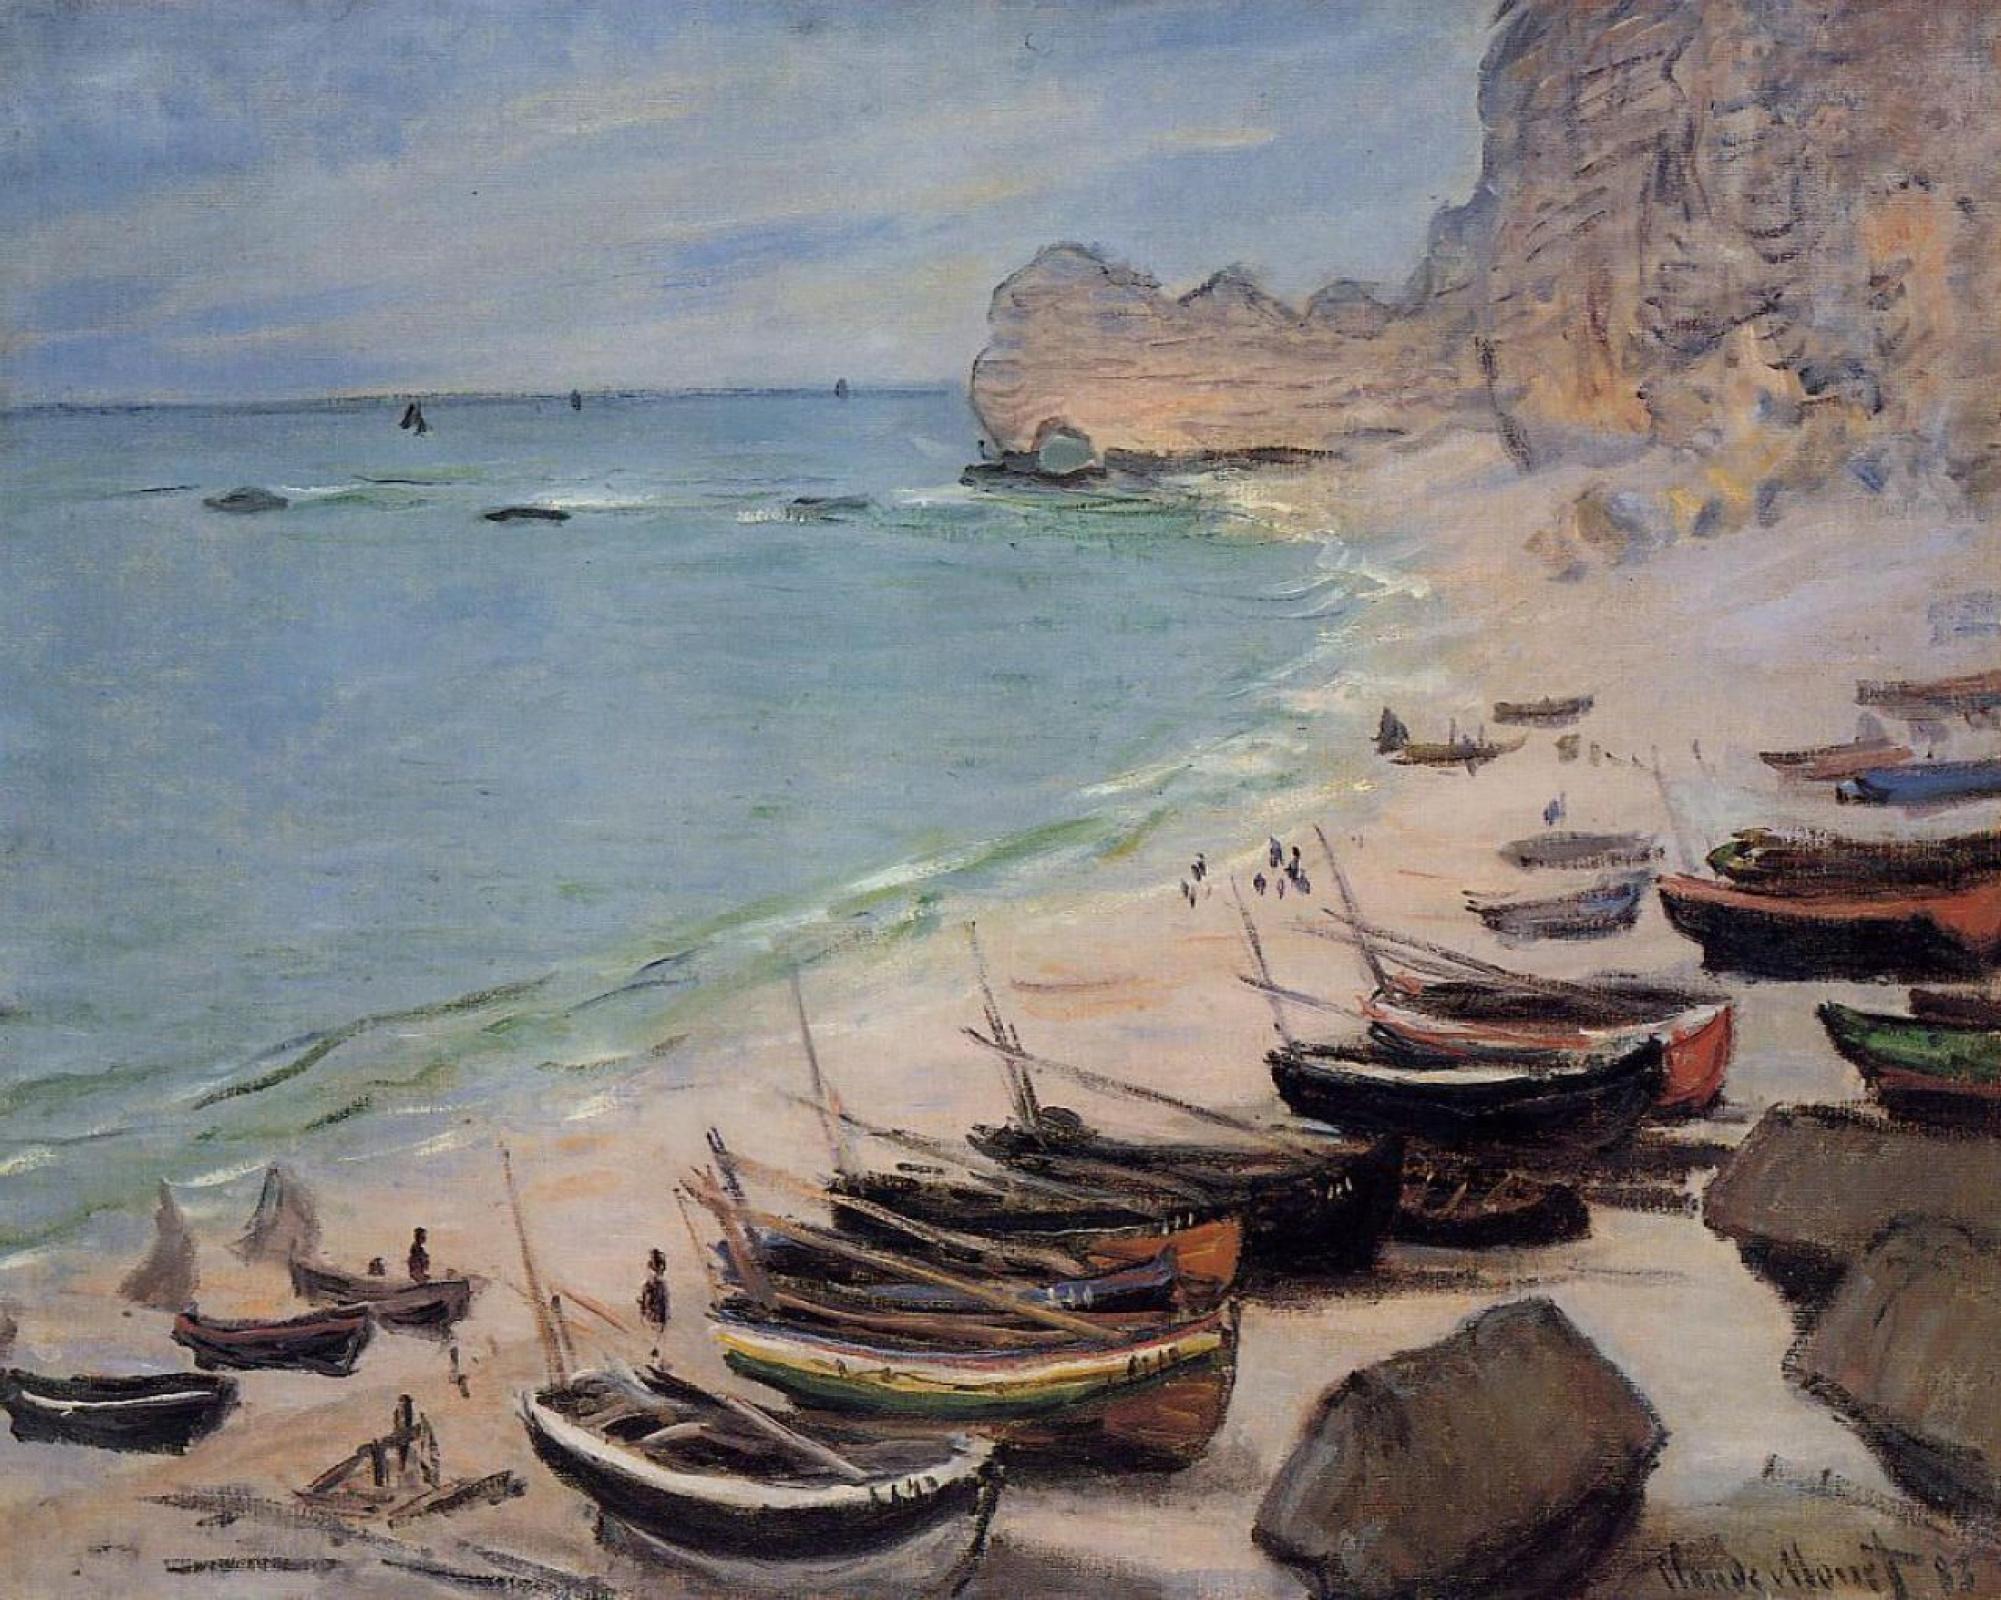 пейзажи - побережье < Лодки у пляжа >:: Клод Моне, описание картины - Моне Клод (Claude Monet) фото